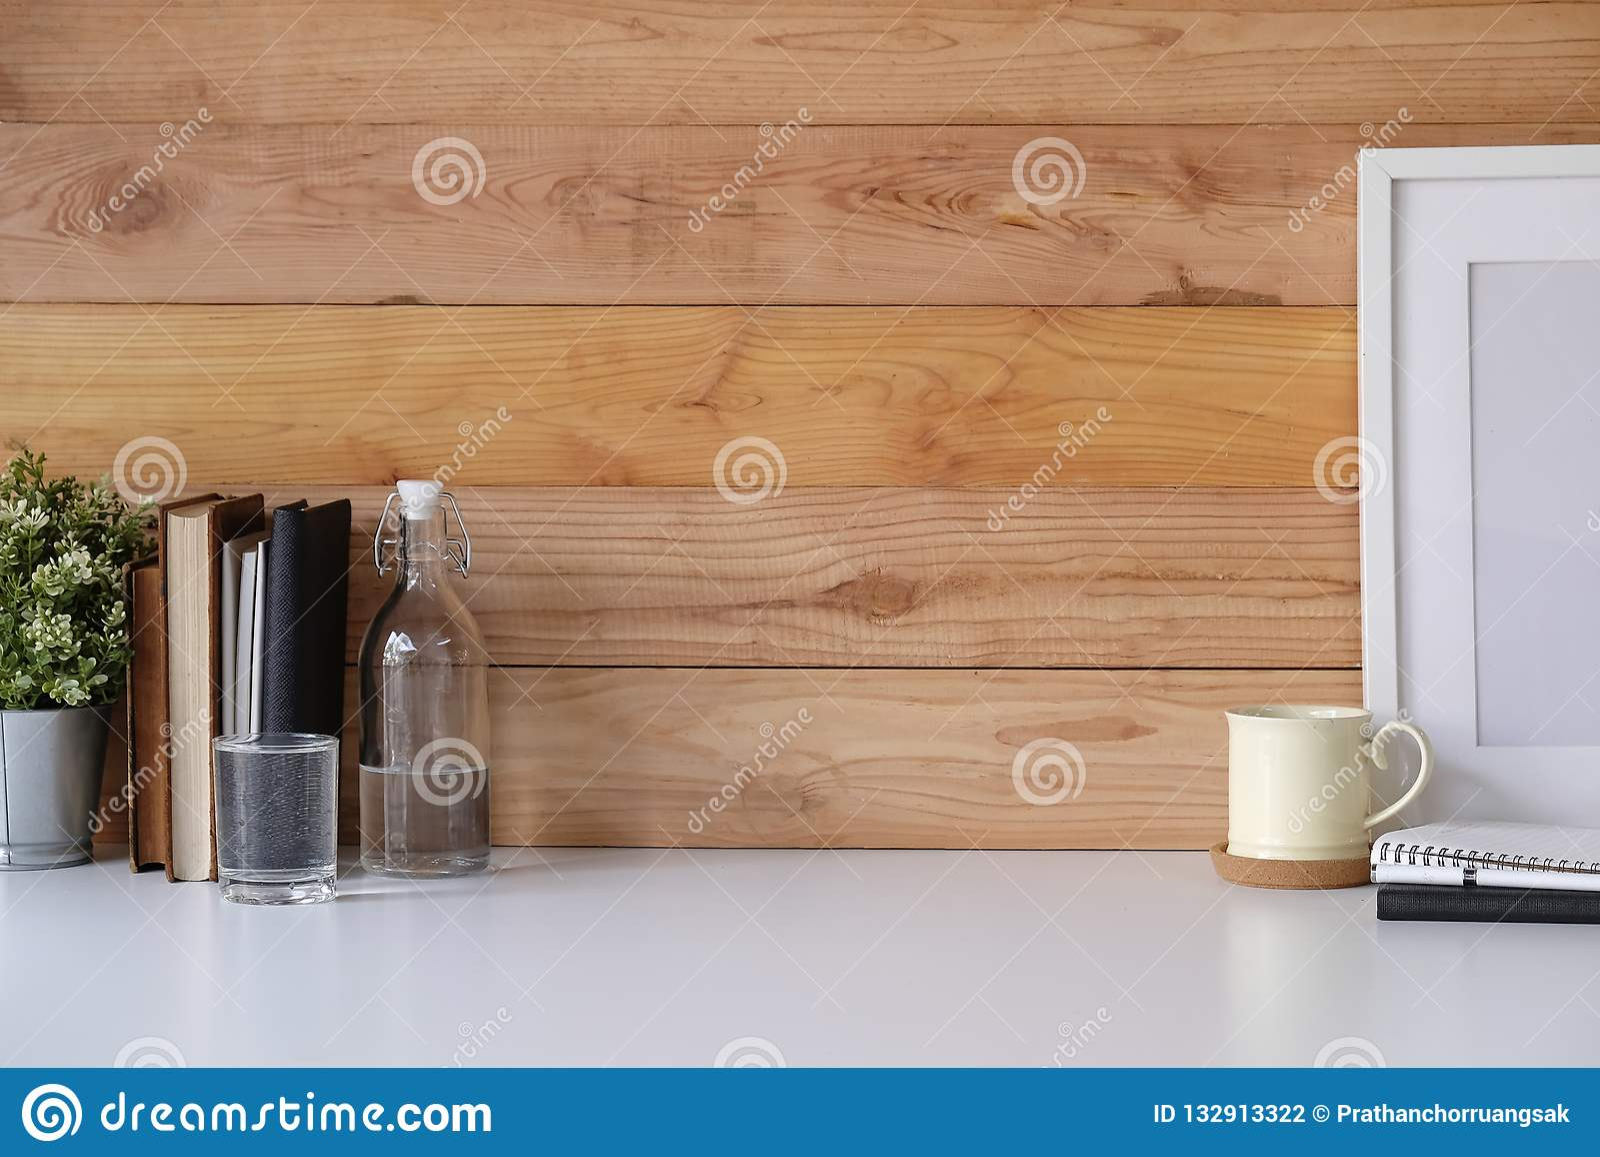 Workspace with copy space coffee mug, plant, photo frame, glass